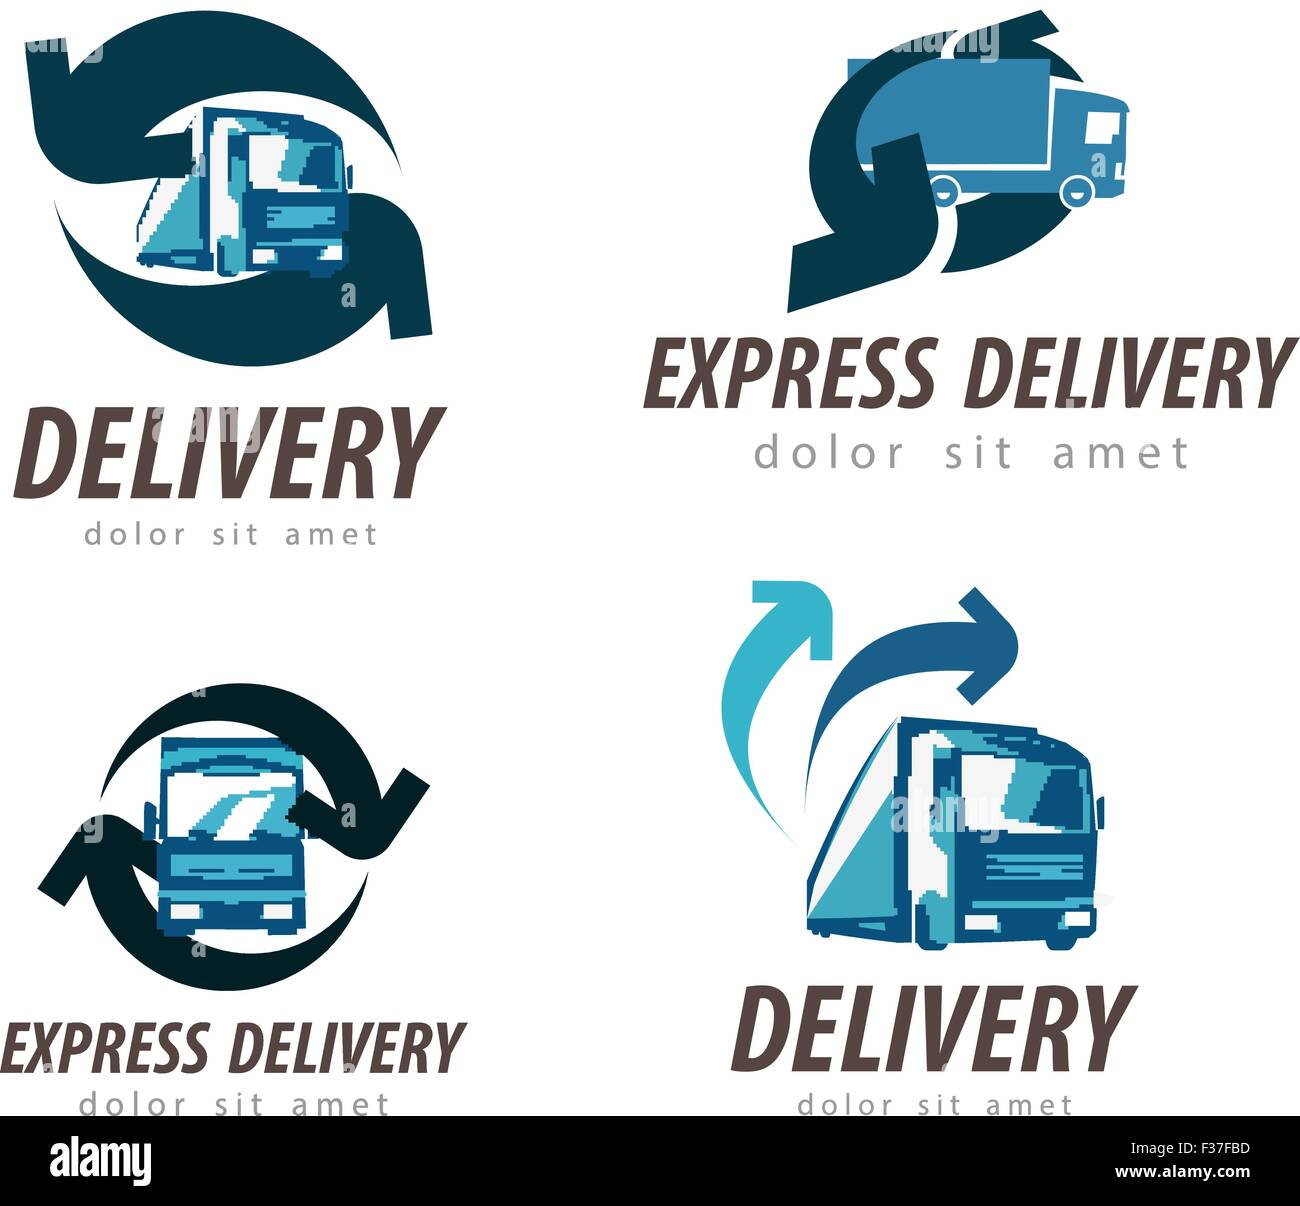 Delivery Goods Vector Logo Design Stockfotos & Delivery Goods Vector ...